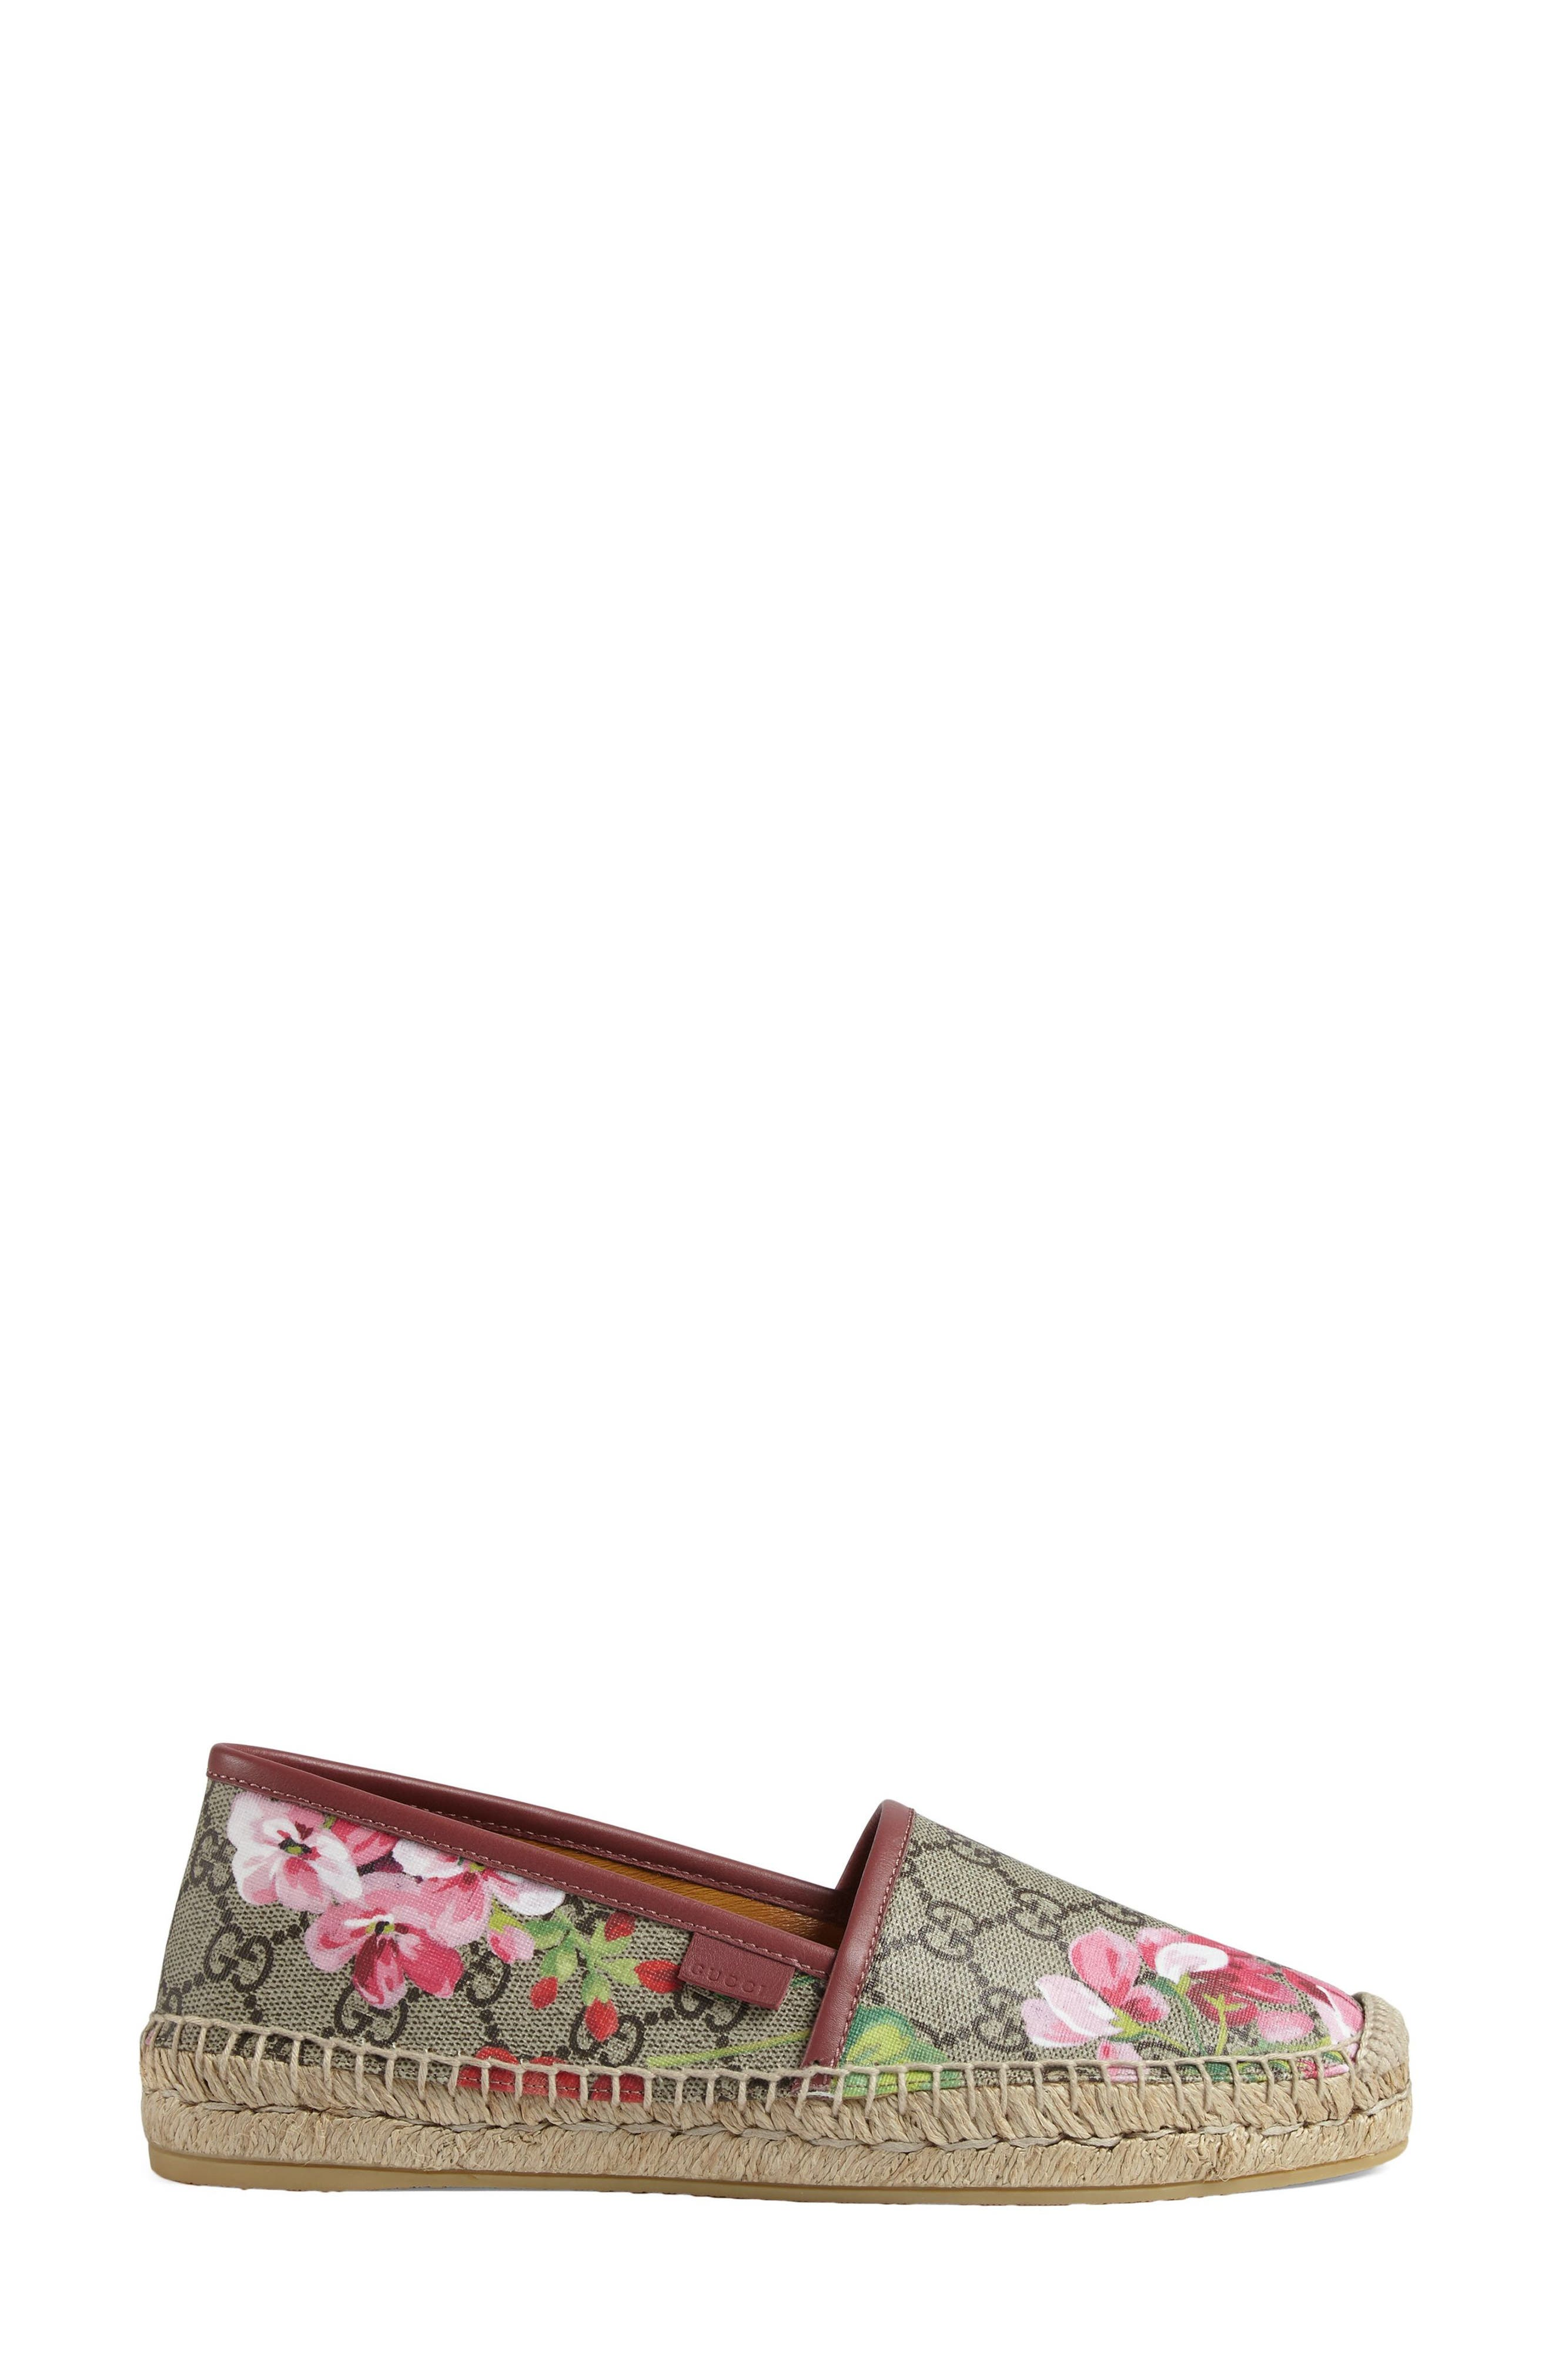 Gucci 'Pilar' Espadrille Slip-On Flat (Women)